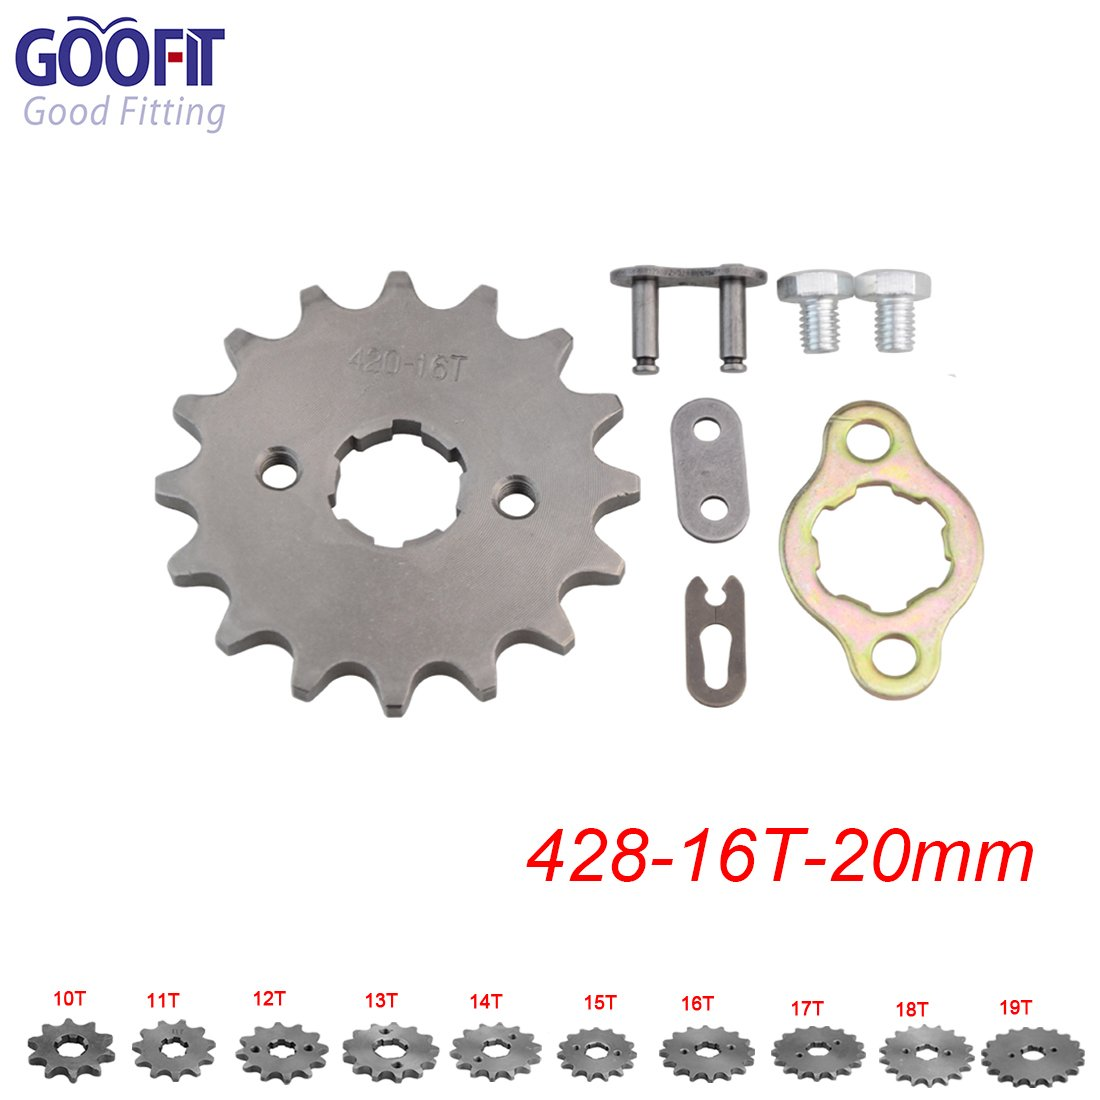 420-16T GOOFIT 20mm Sprocket Front for Motorcycle ATV Dirt Bike